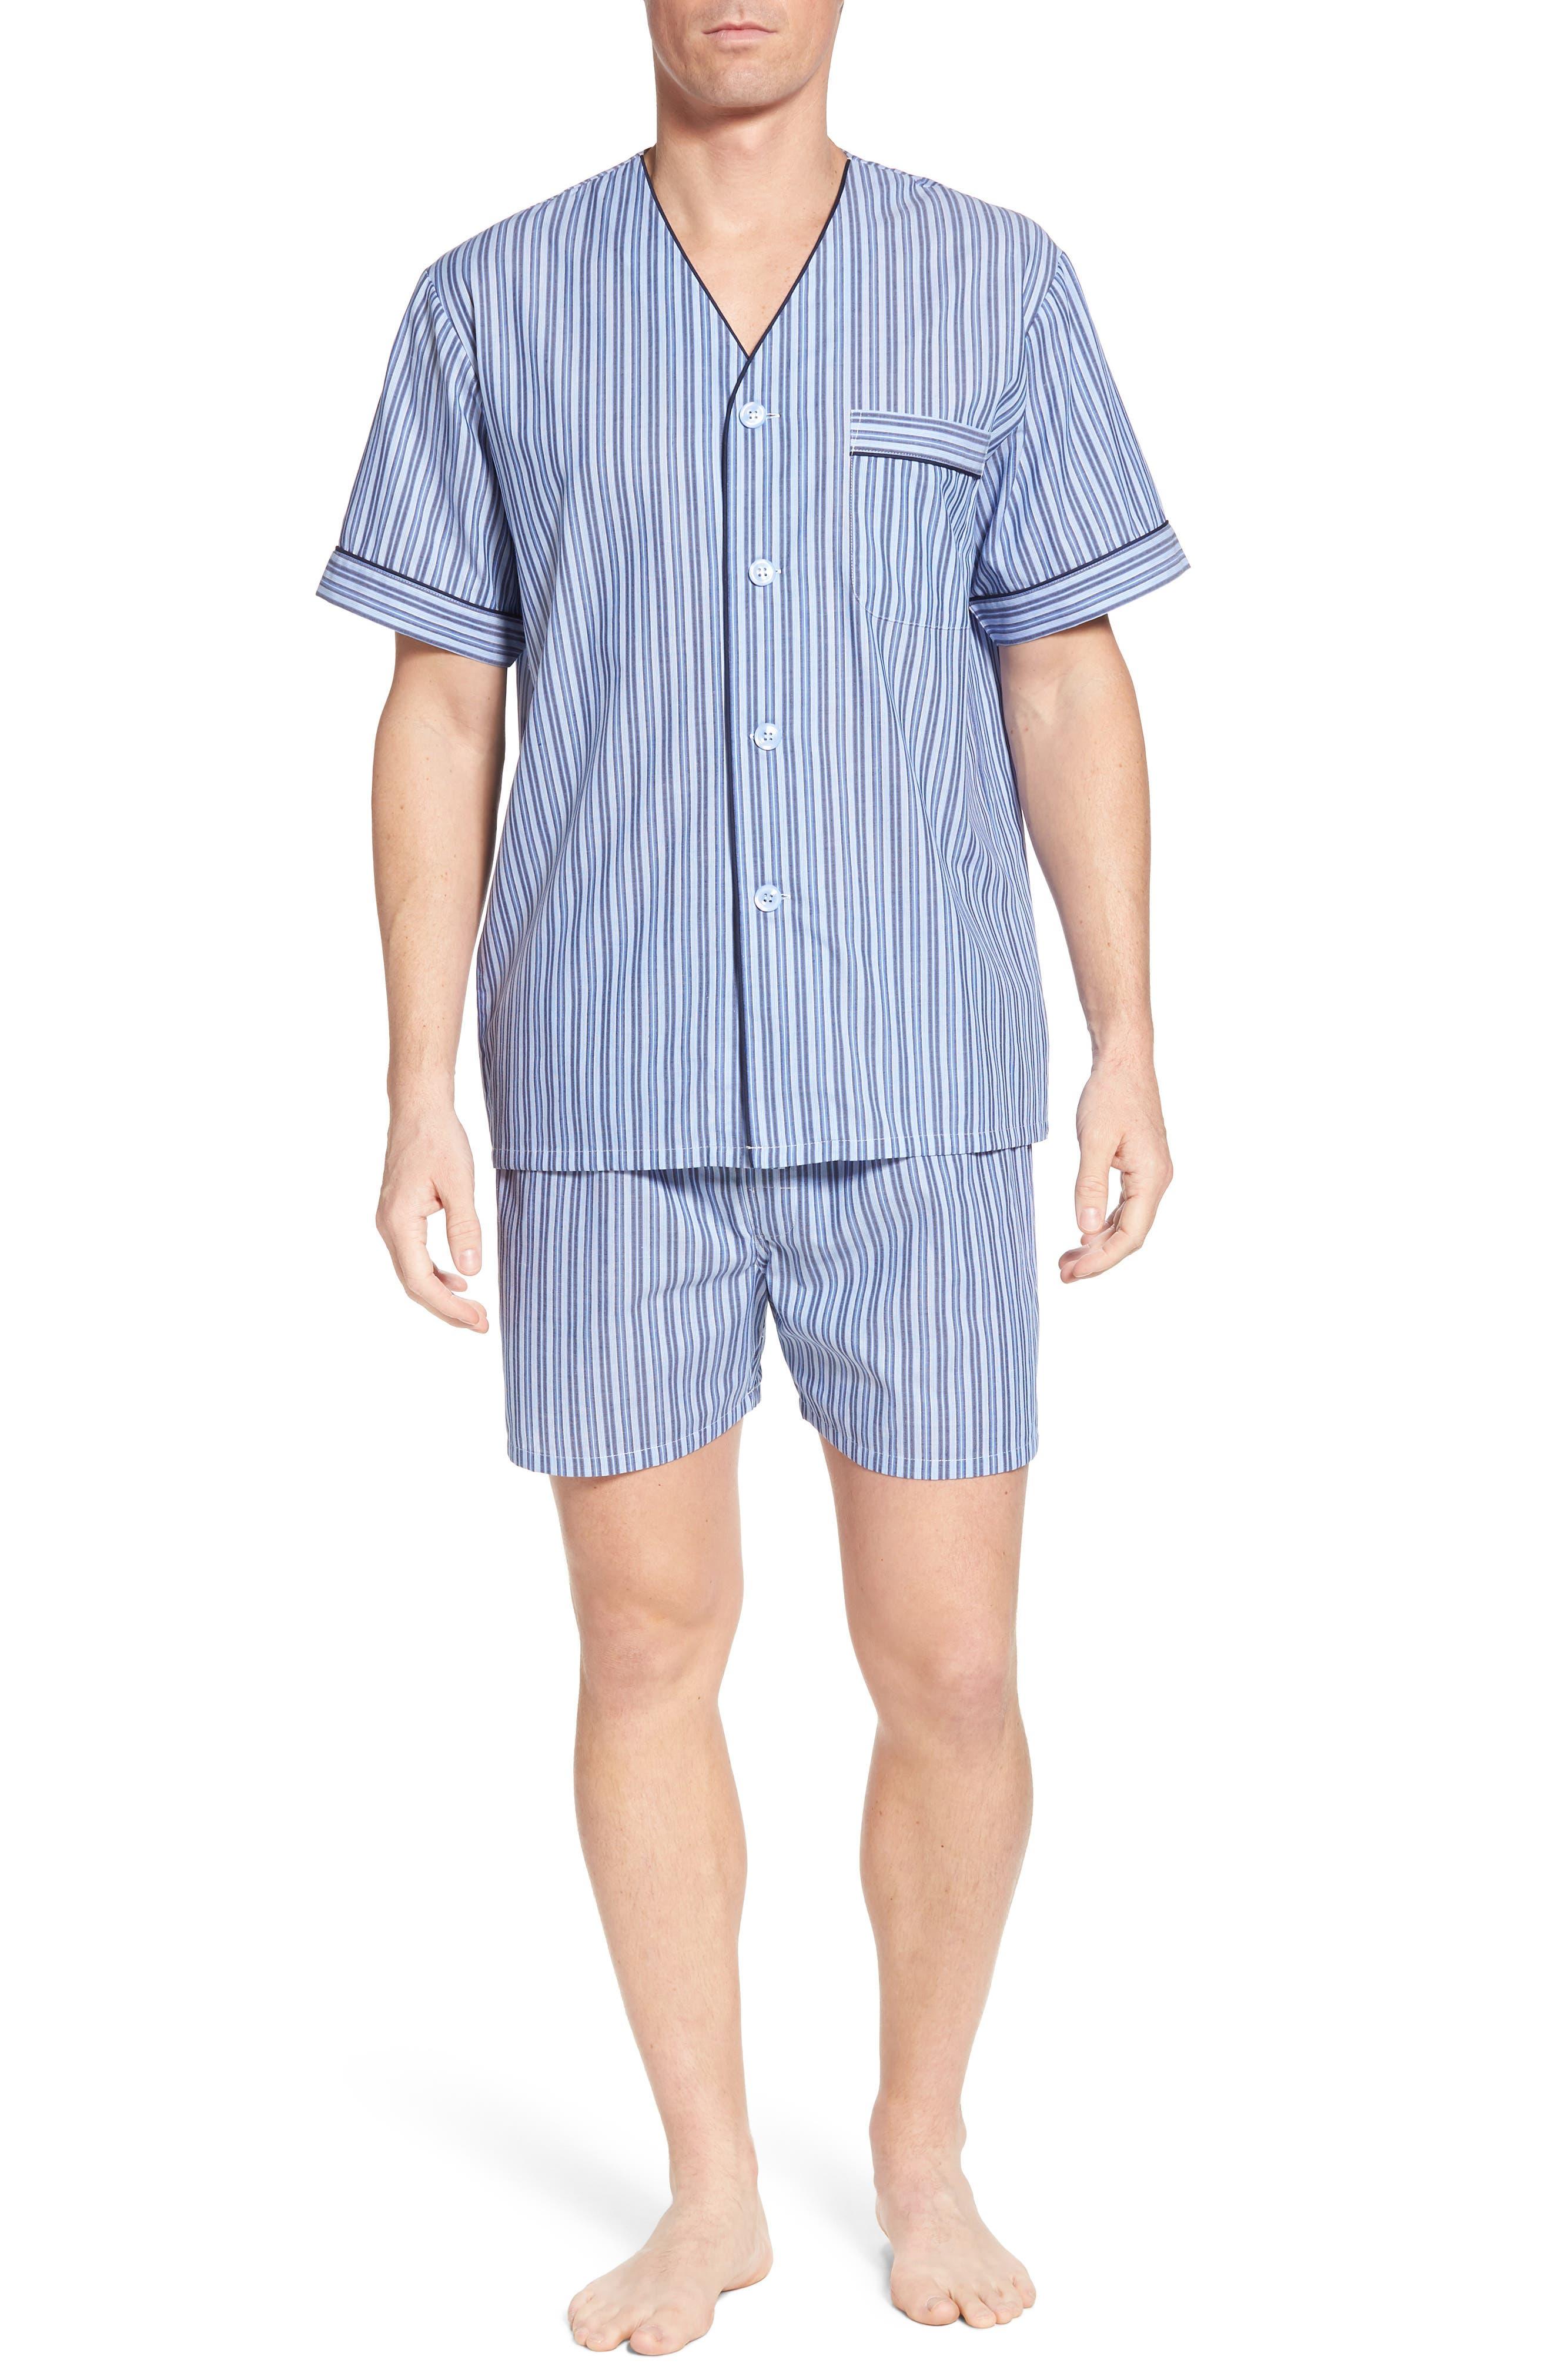 Carefree Shorty Pajama Set,                             Main thumbnail 1, color,                             Blue Stripe